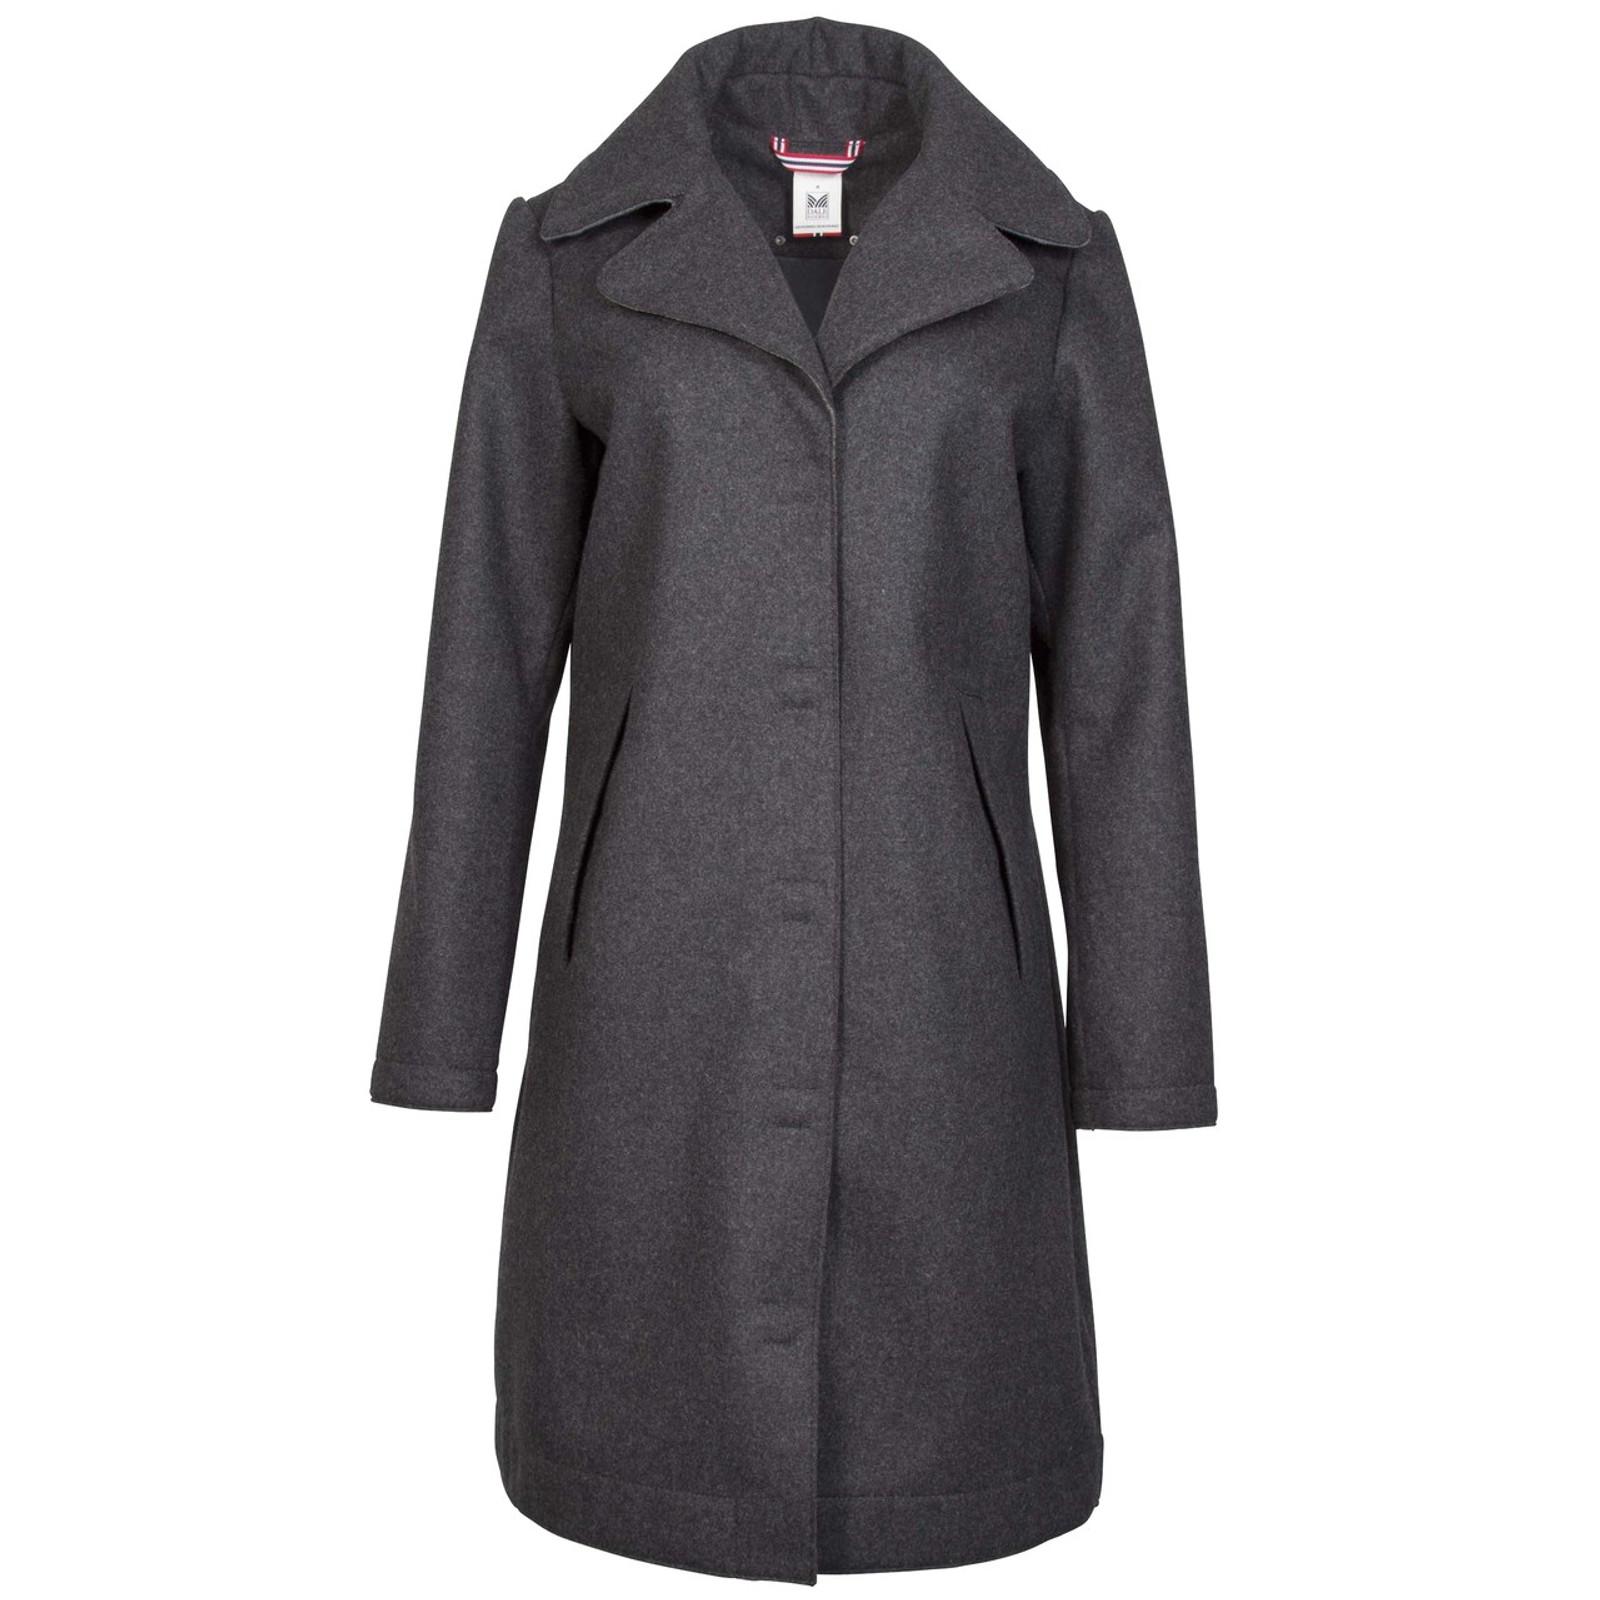 Dale of Norway Yr Woolshell Jacket, Ladies - Dark Charcoal, 85201-E